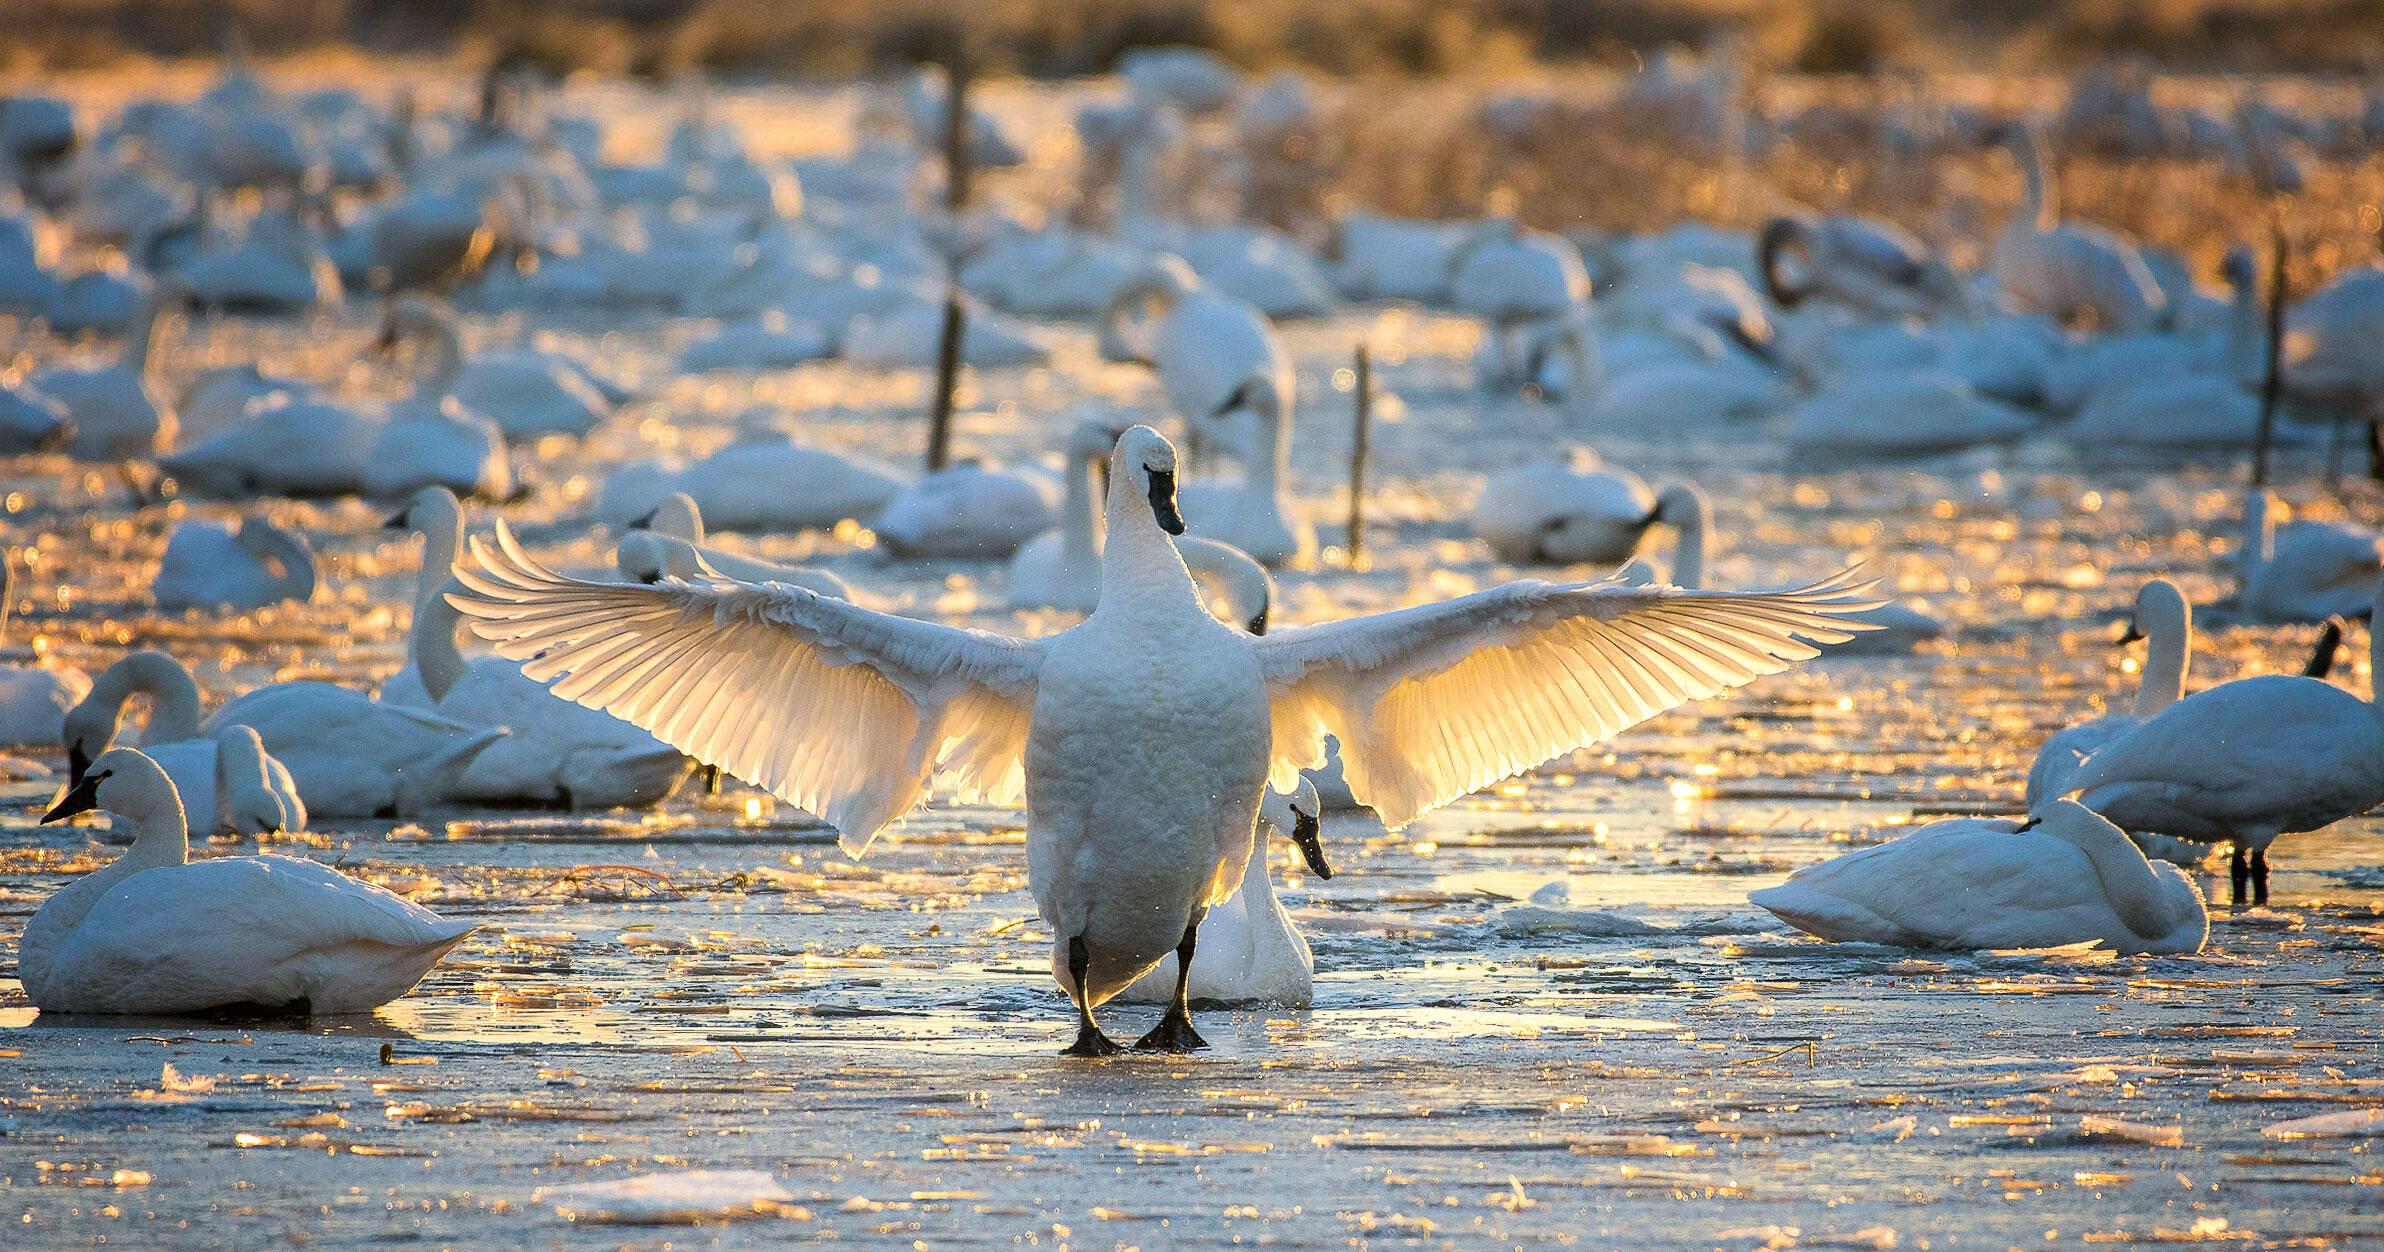 Tundra Swans. Lynn Long/Audubon Photography Awards